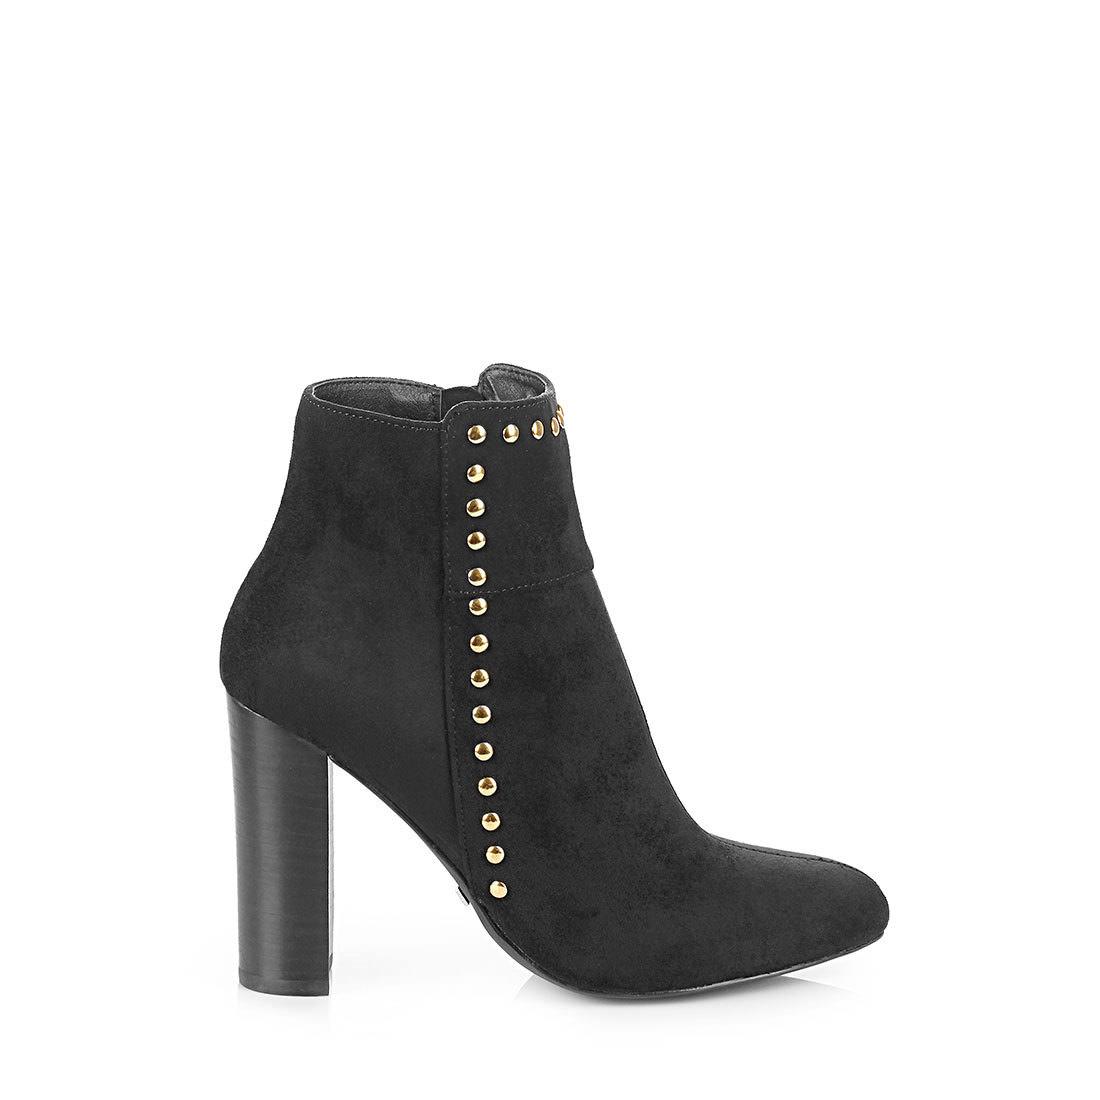 Buffalo »Lederimitat« High Heel Stiefelette kaufen | OTTO